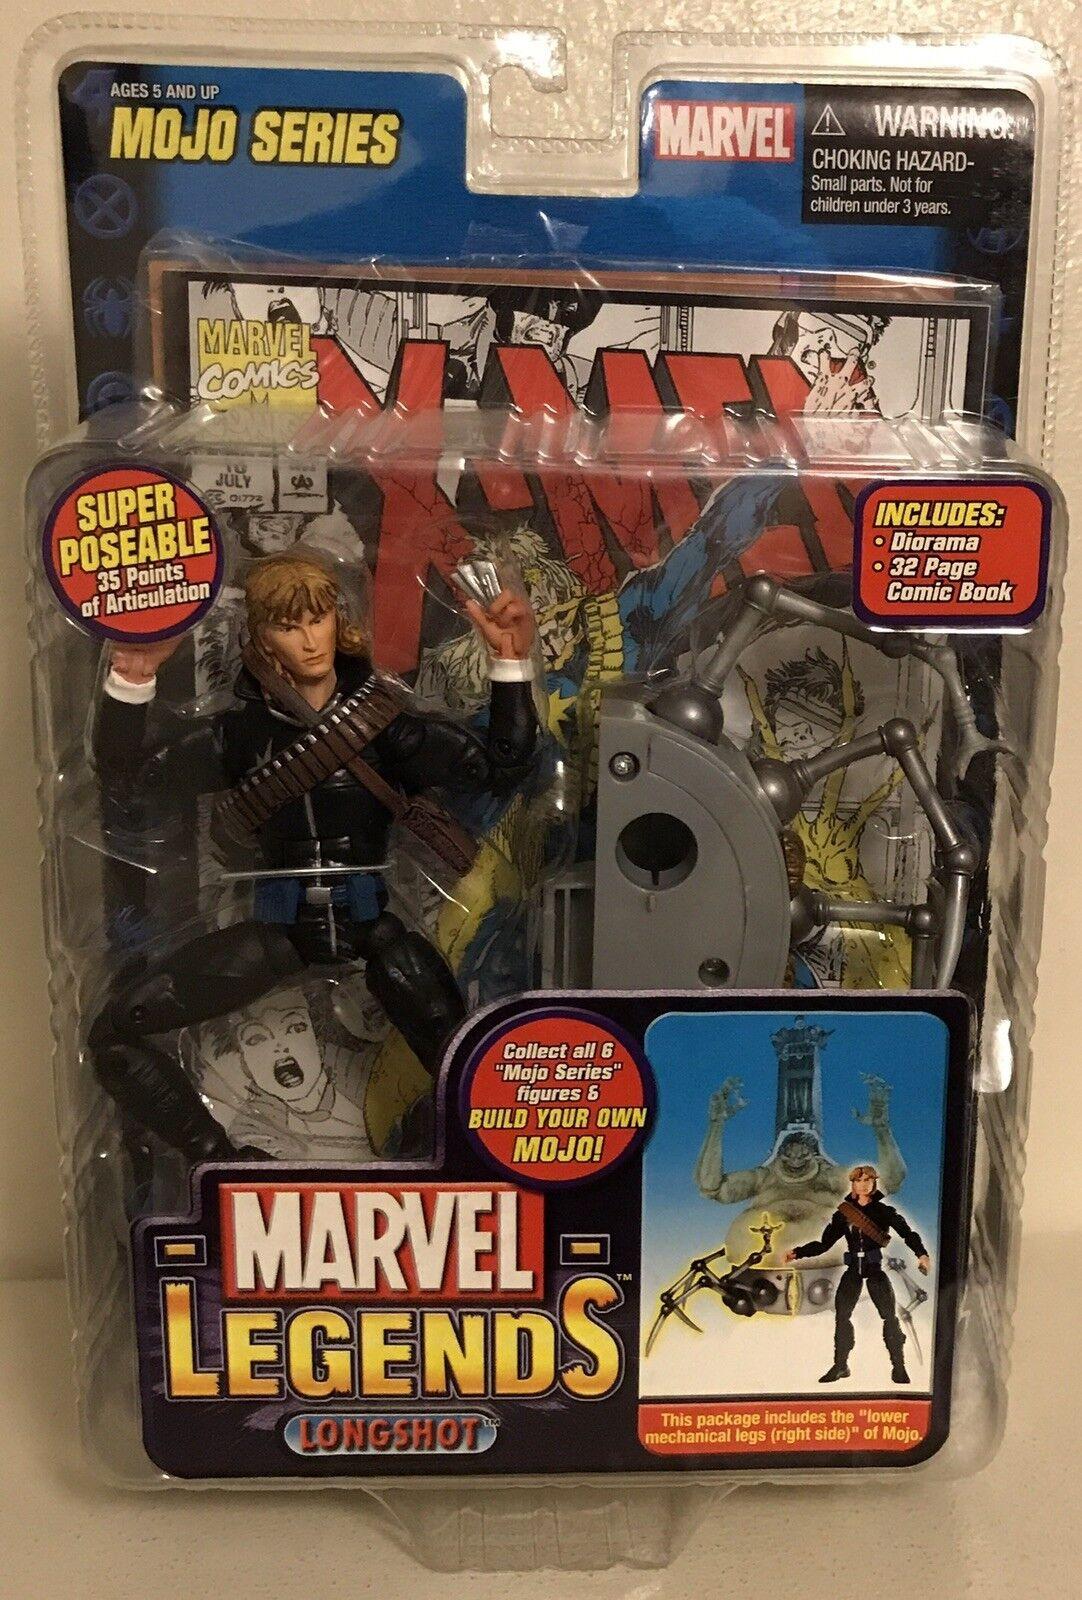 New Marvel Legends Mojo Series Longshot Toy Biz Mechanical Right Side Leg 35pts